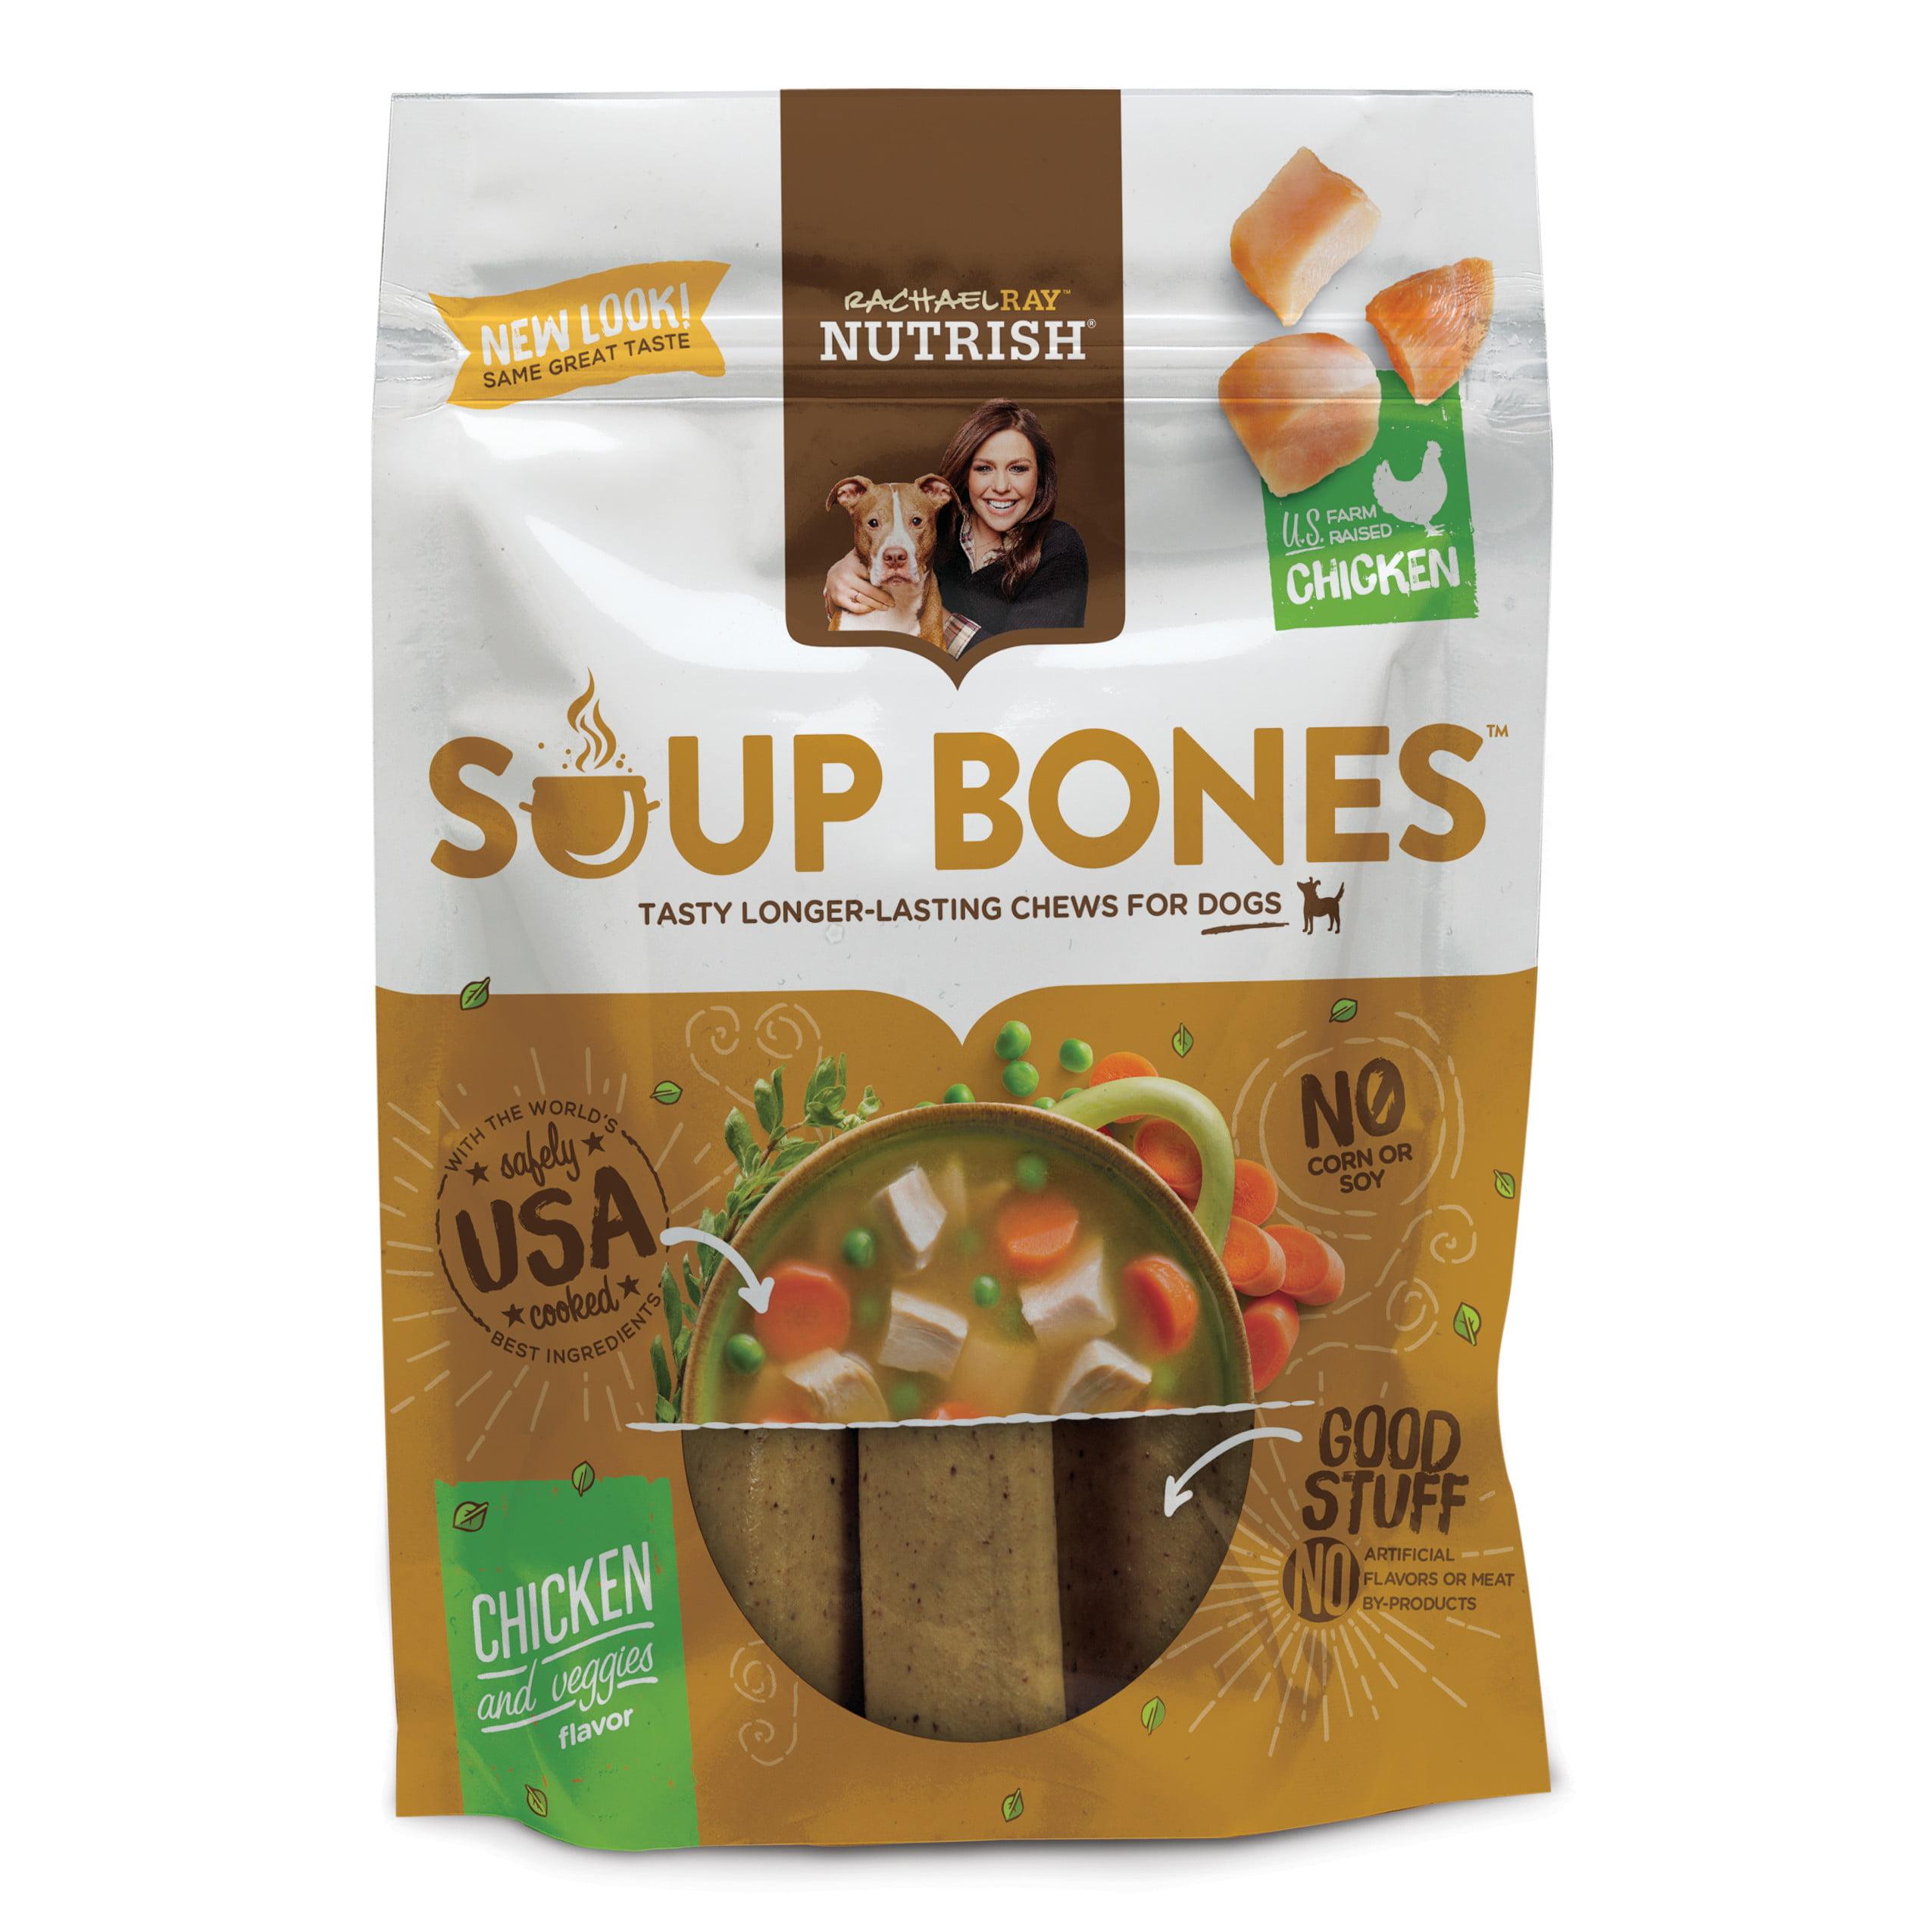 Rachael Ray Nutrish Soup Bones Dog Treats, Chicken & Veggies Flavor, 12.6oz